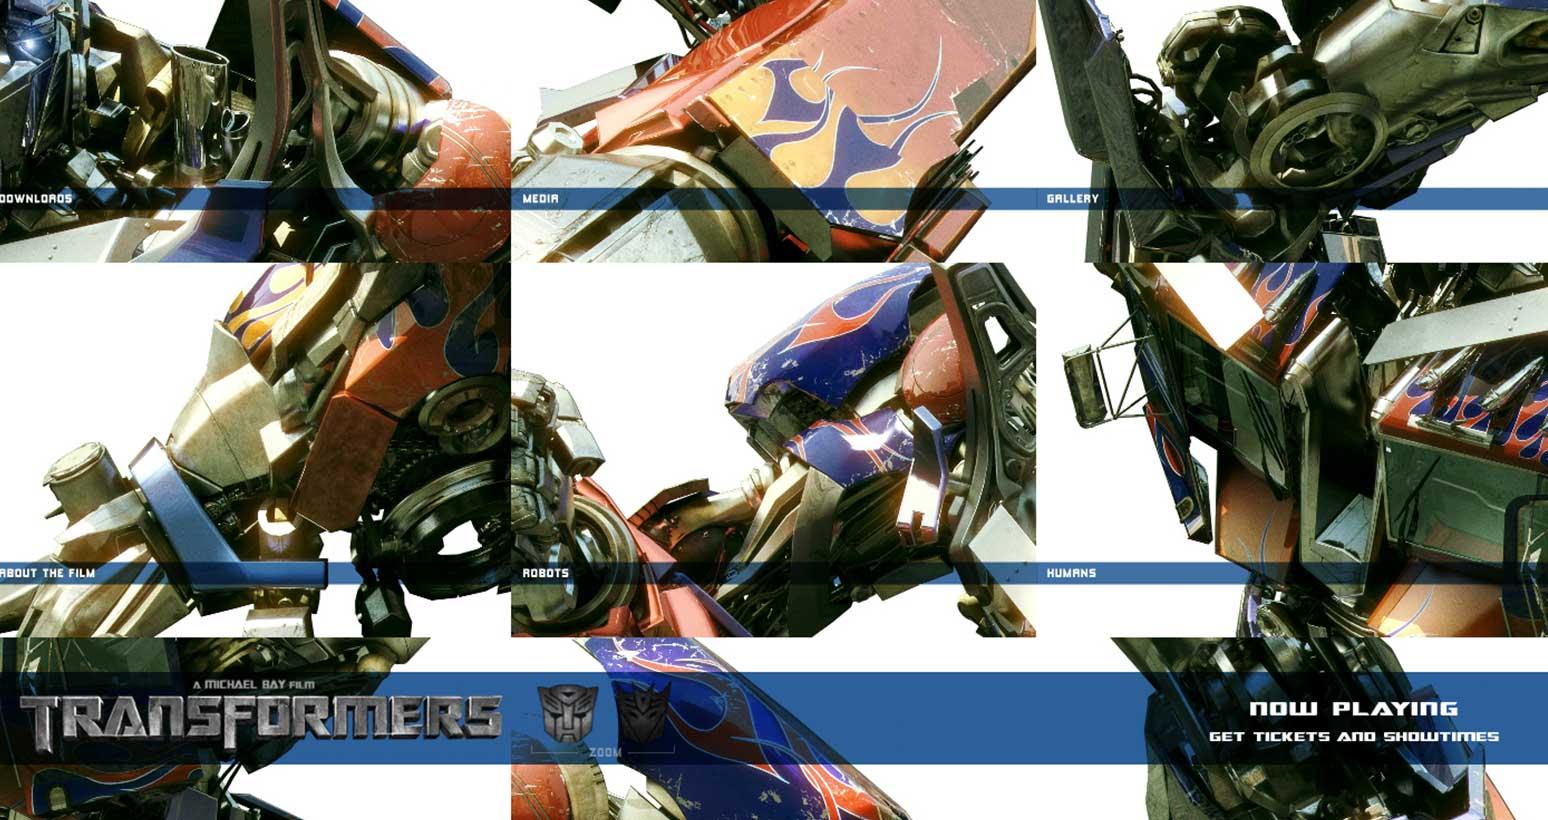 Transformers Movie Website